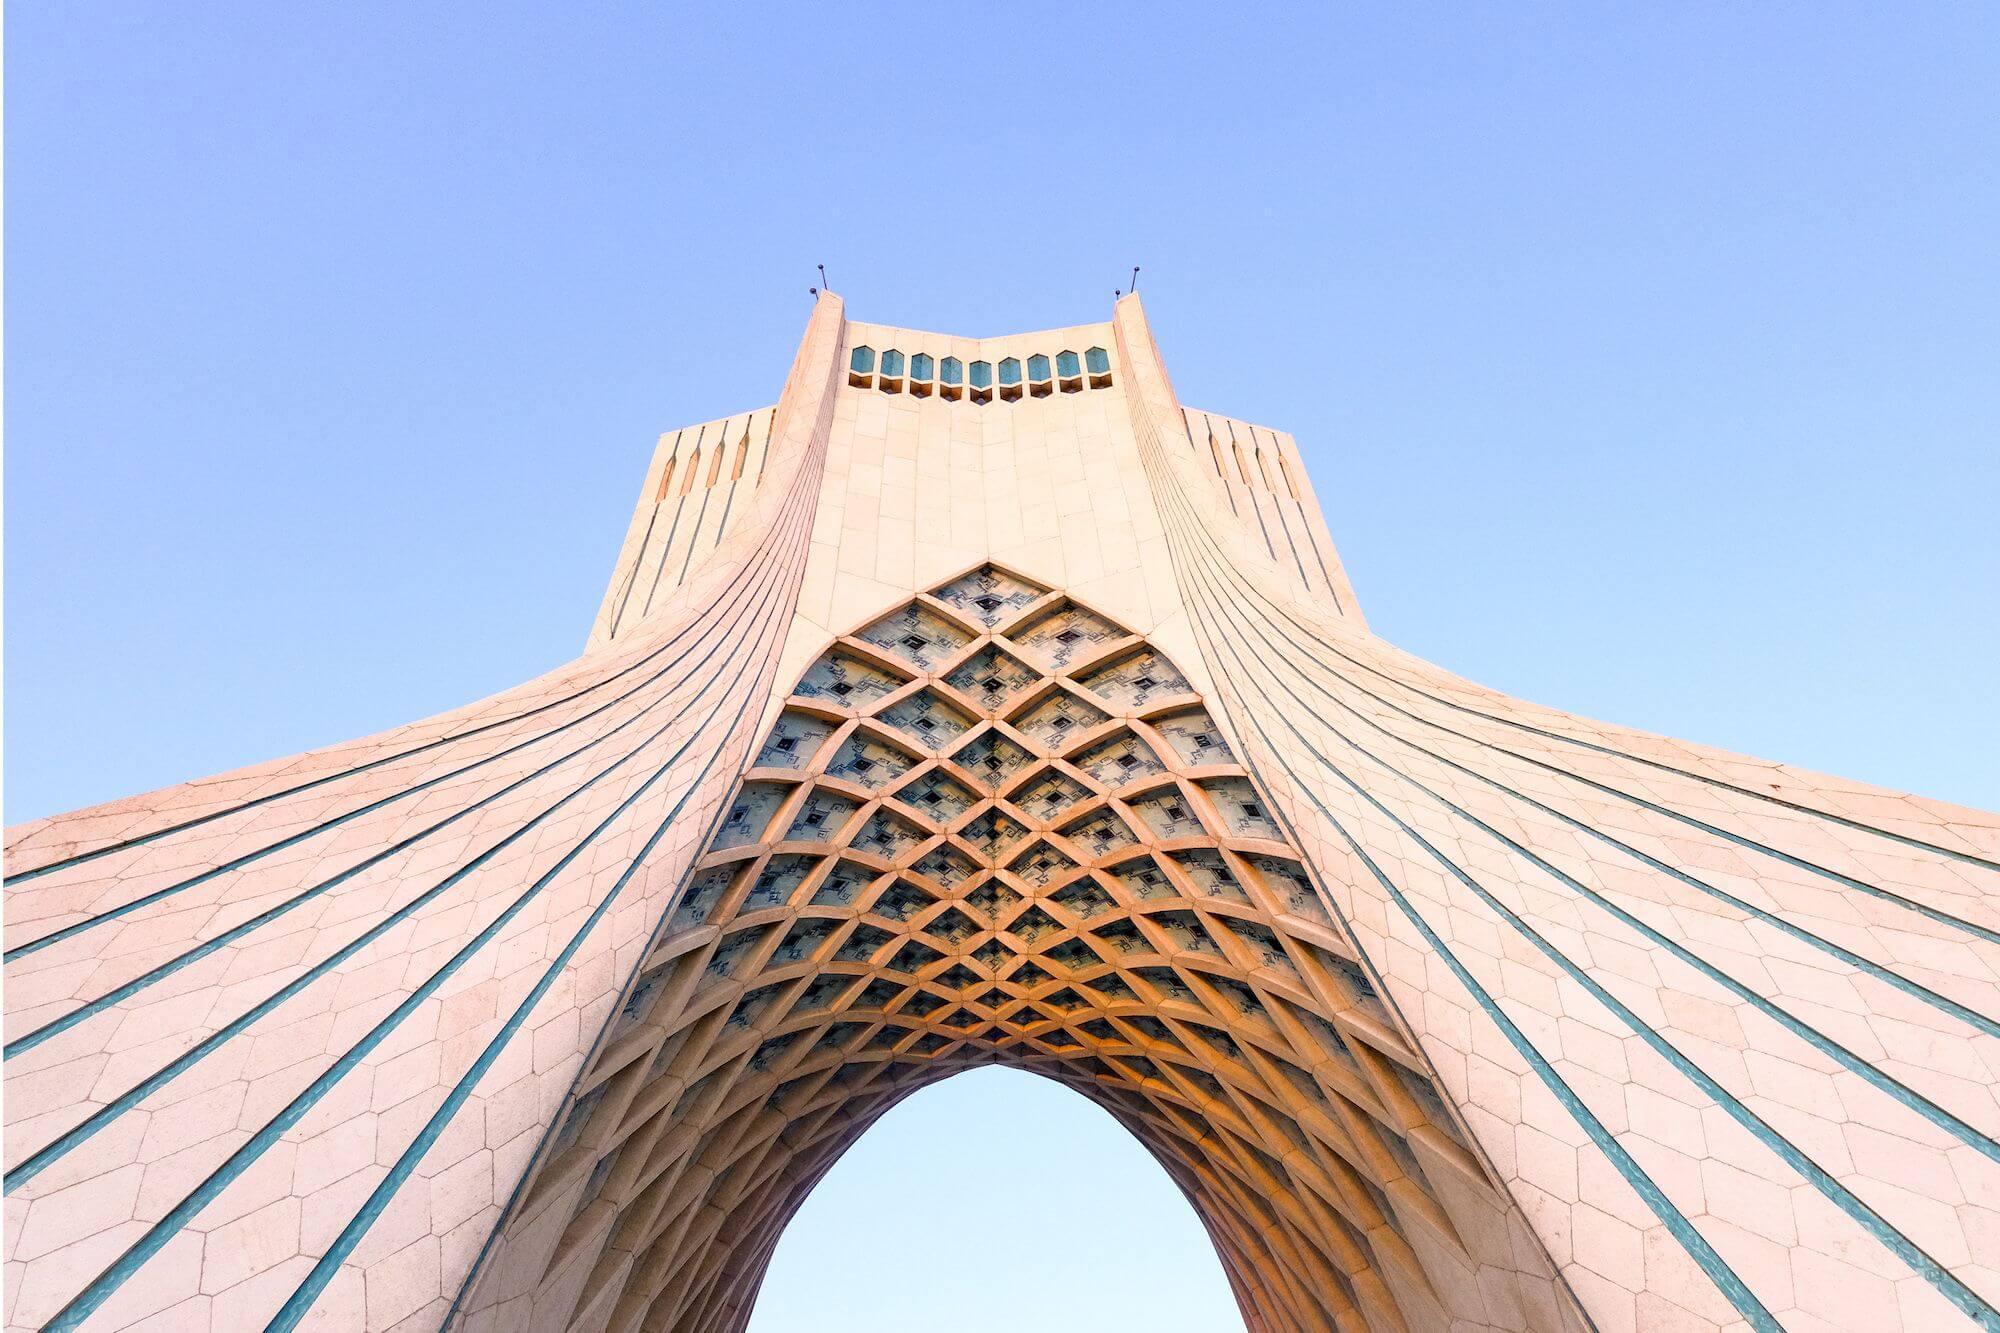 Teheran Azadi Tower 1 compressor 3 giorni a Teheran